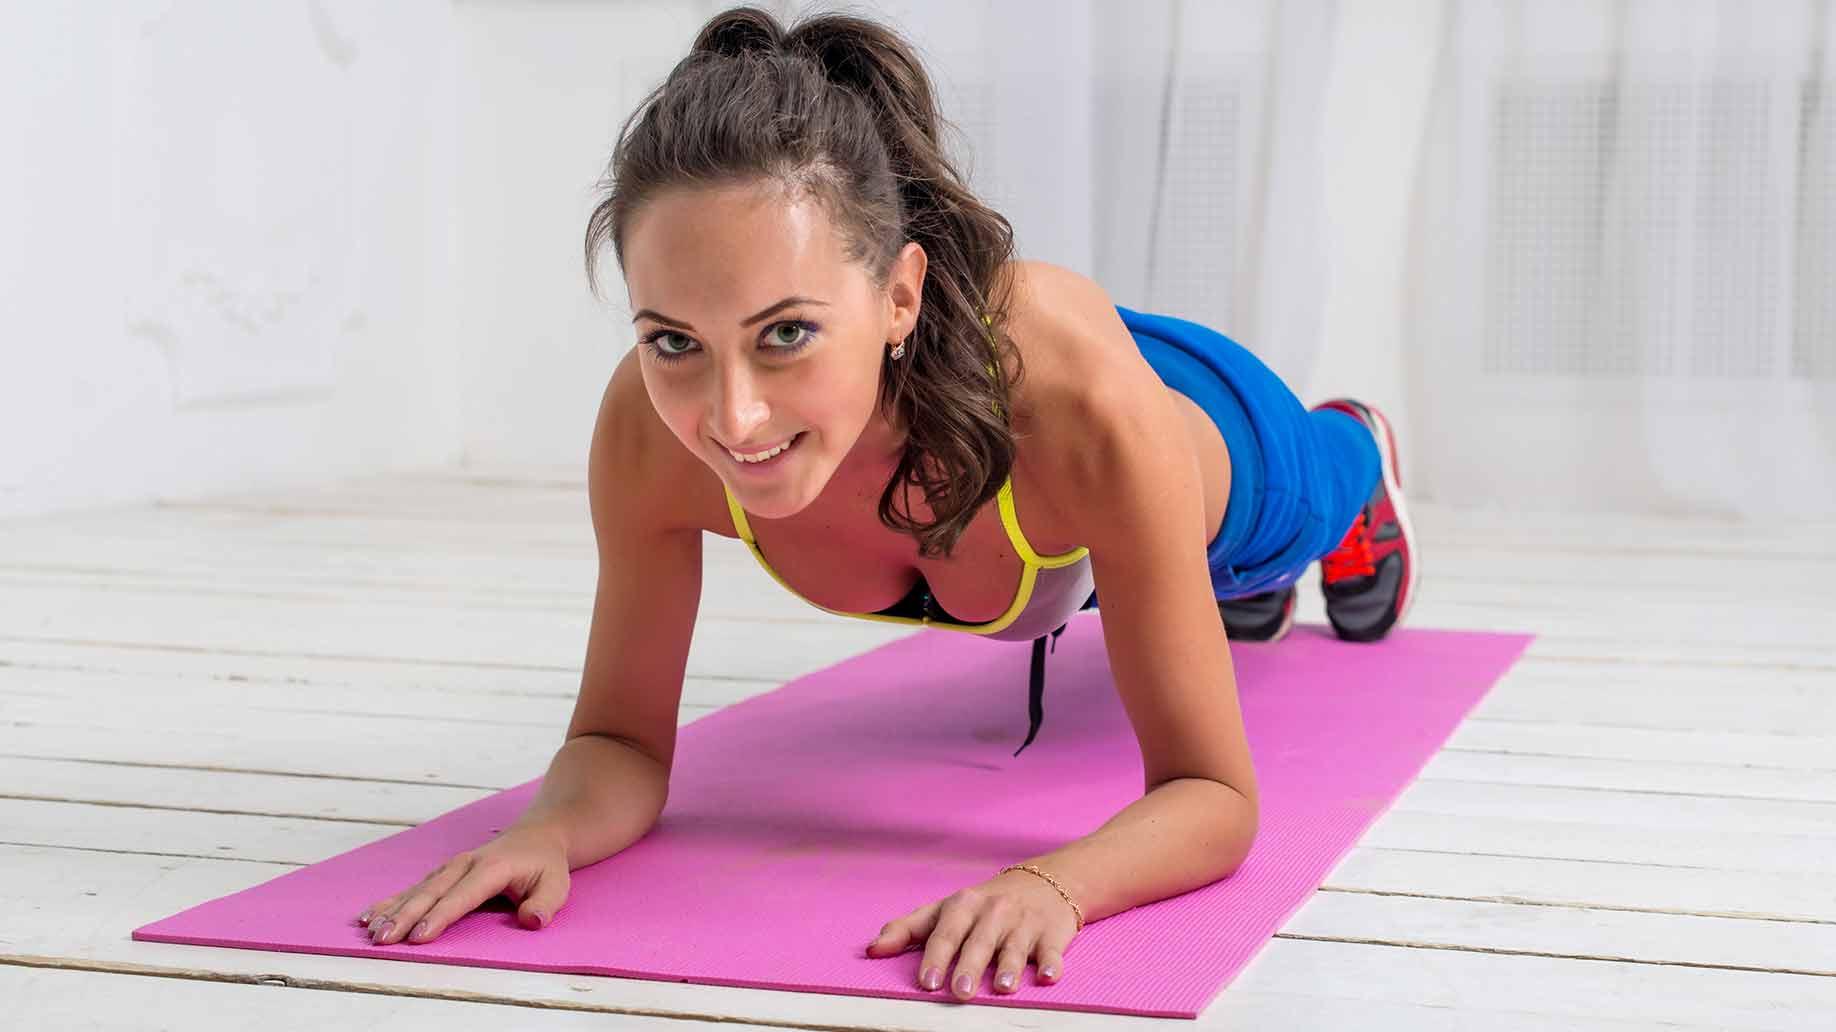 yoga exercise aerobics girl with pink mat